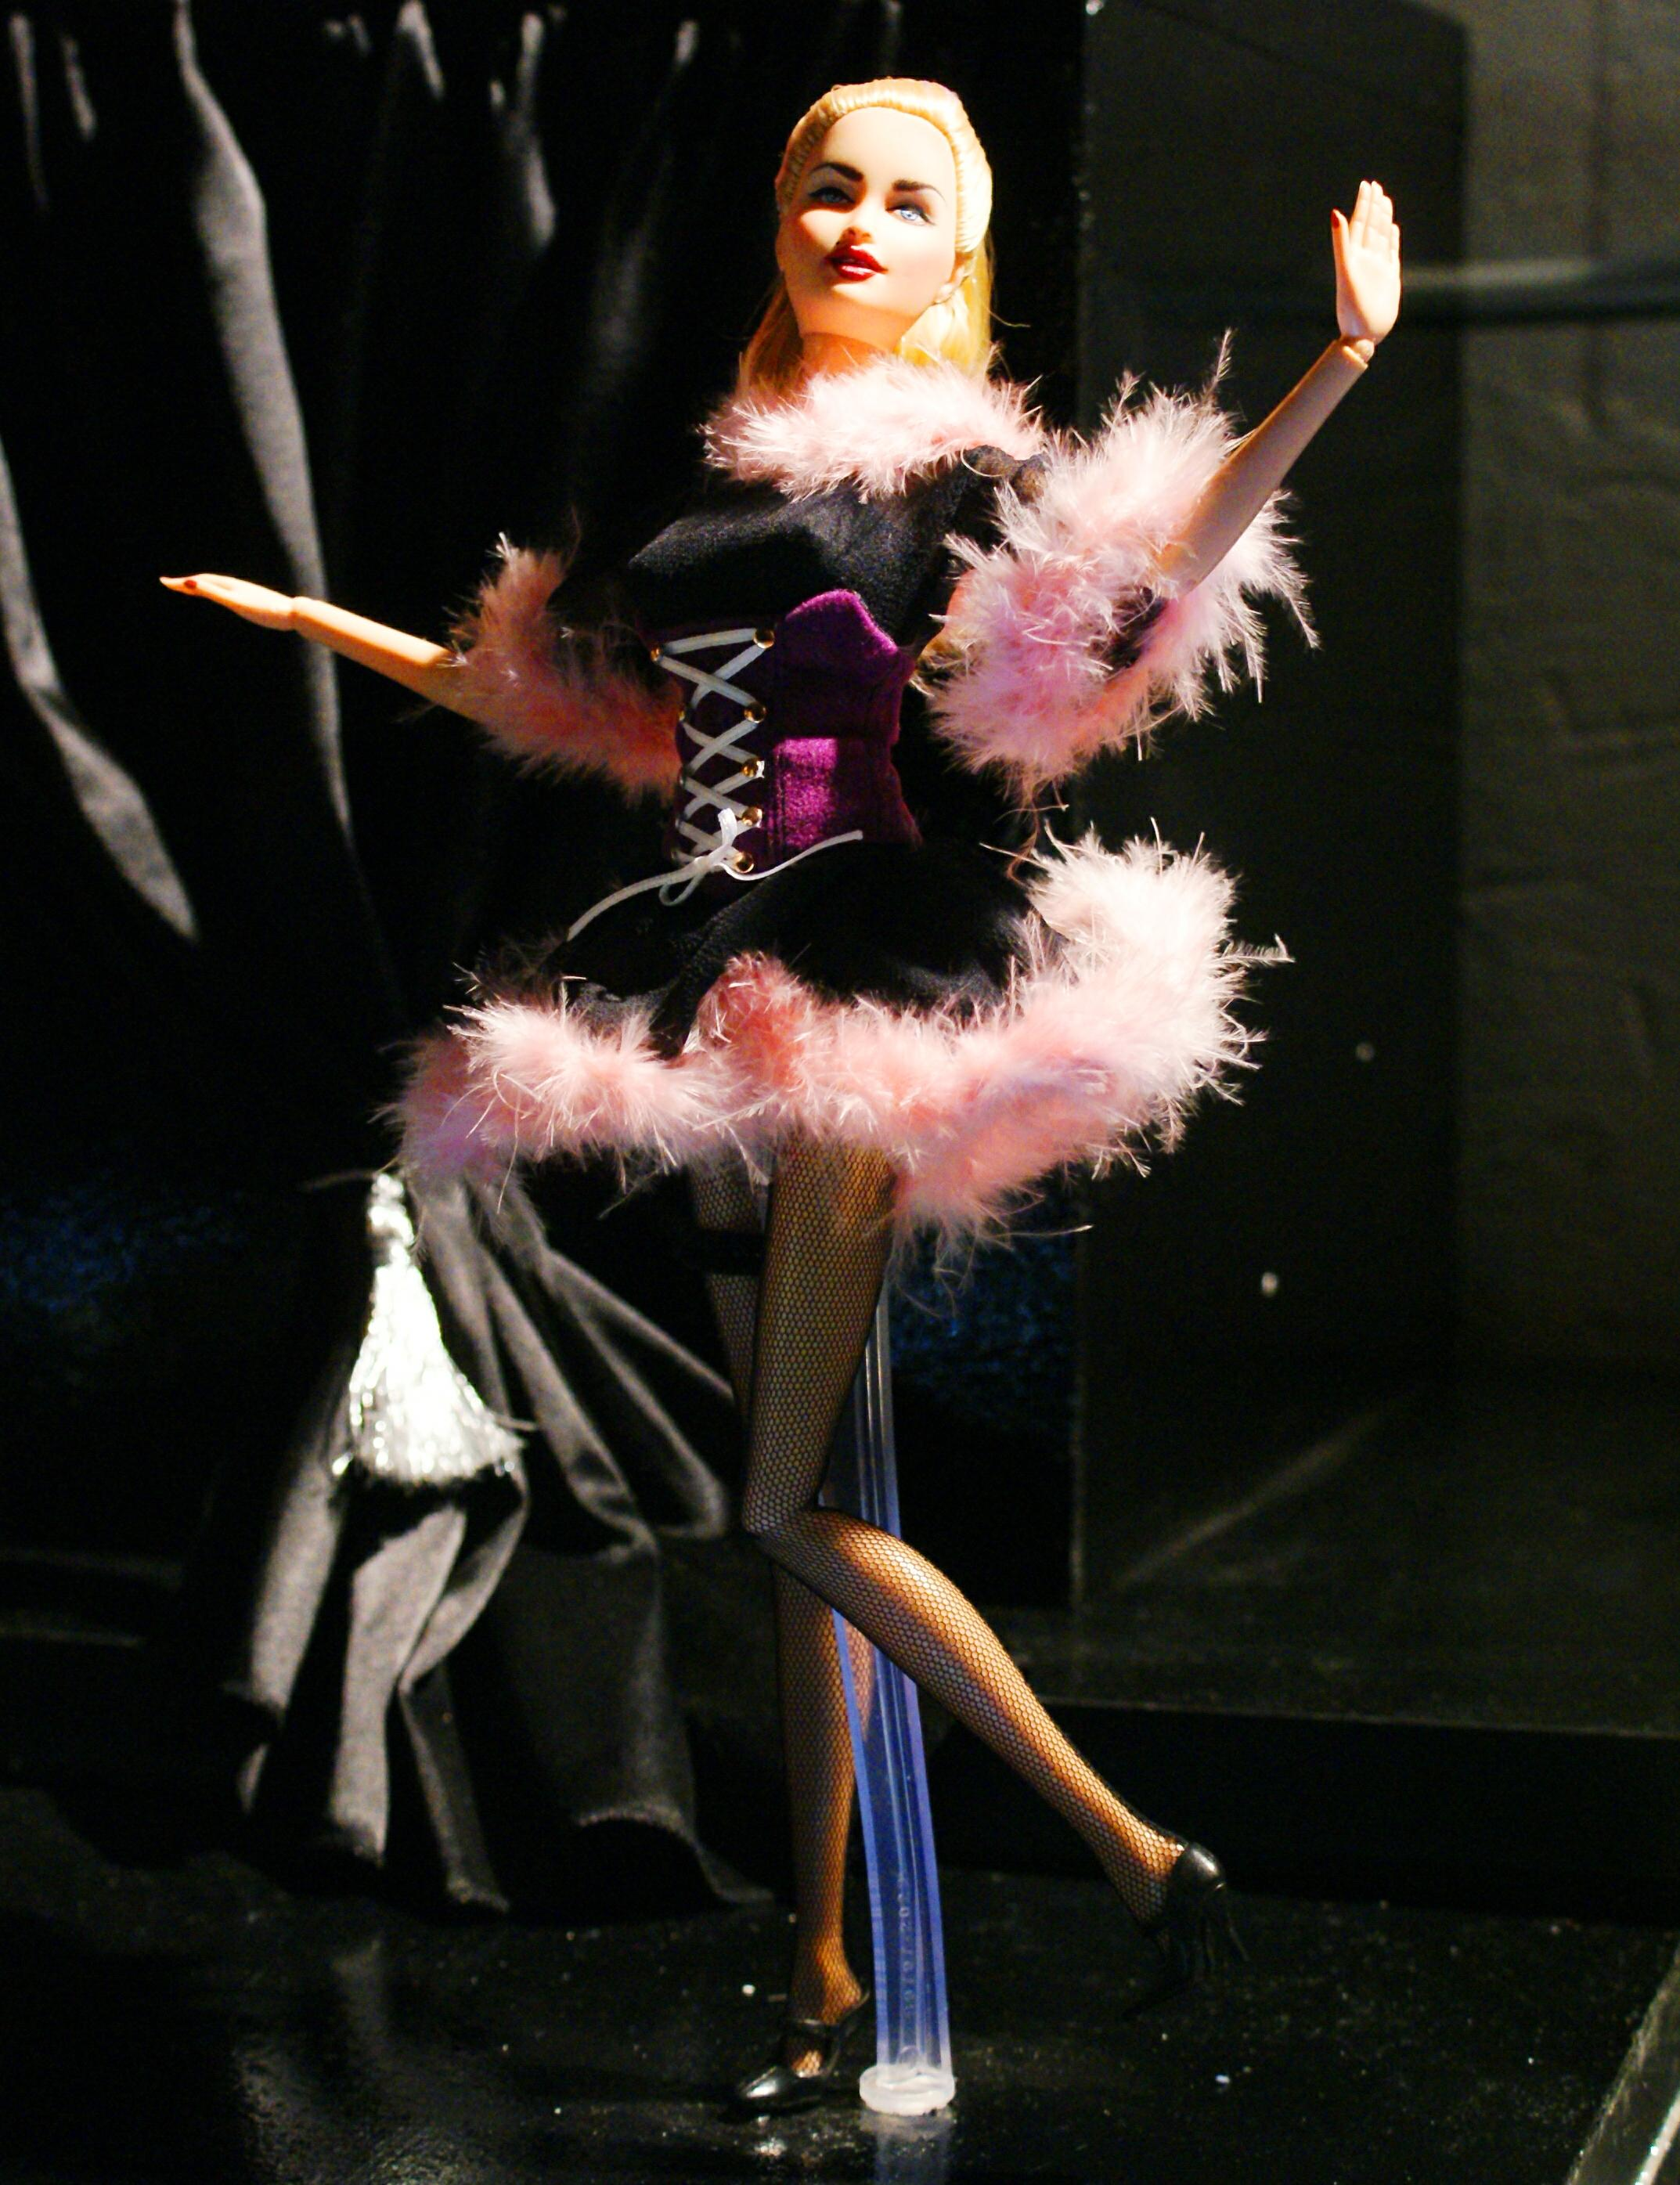 Madonna-blond_ambition-doll.jpg